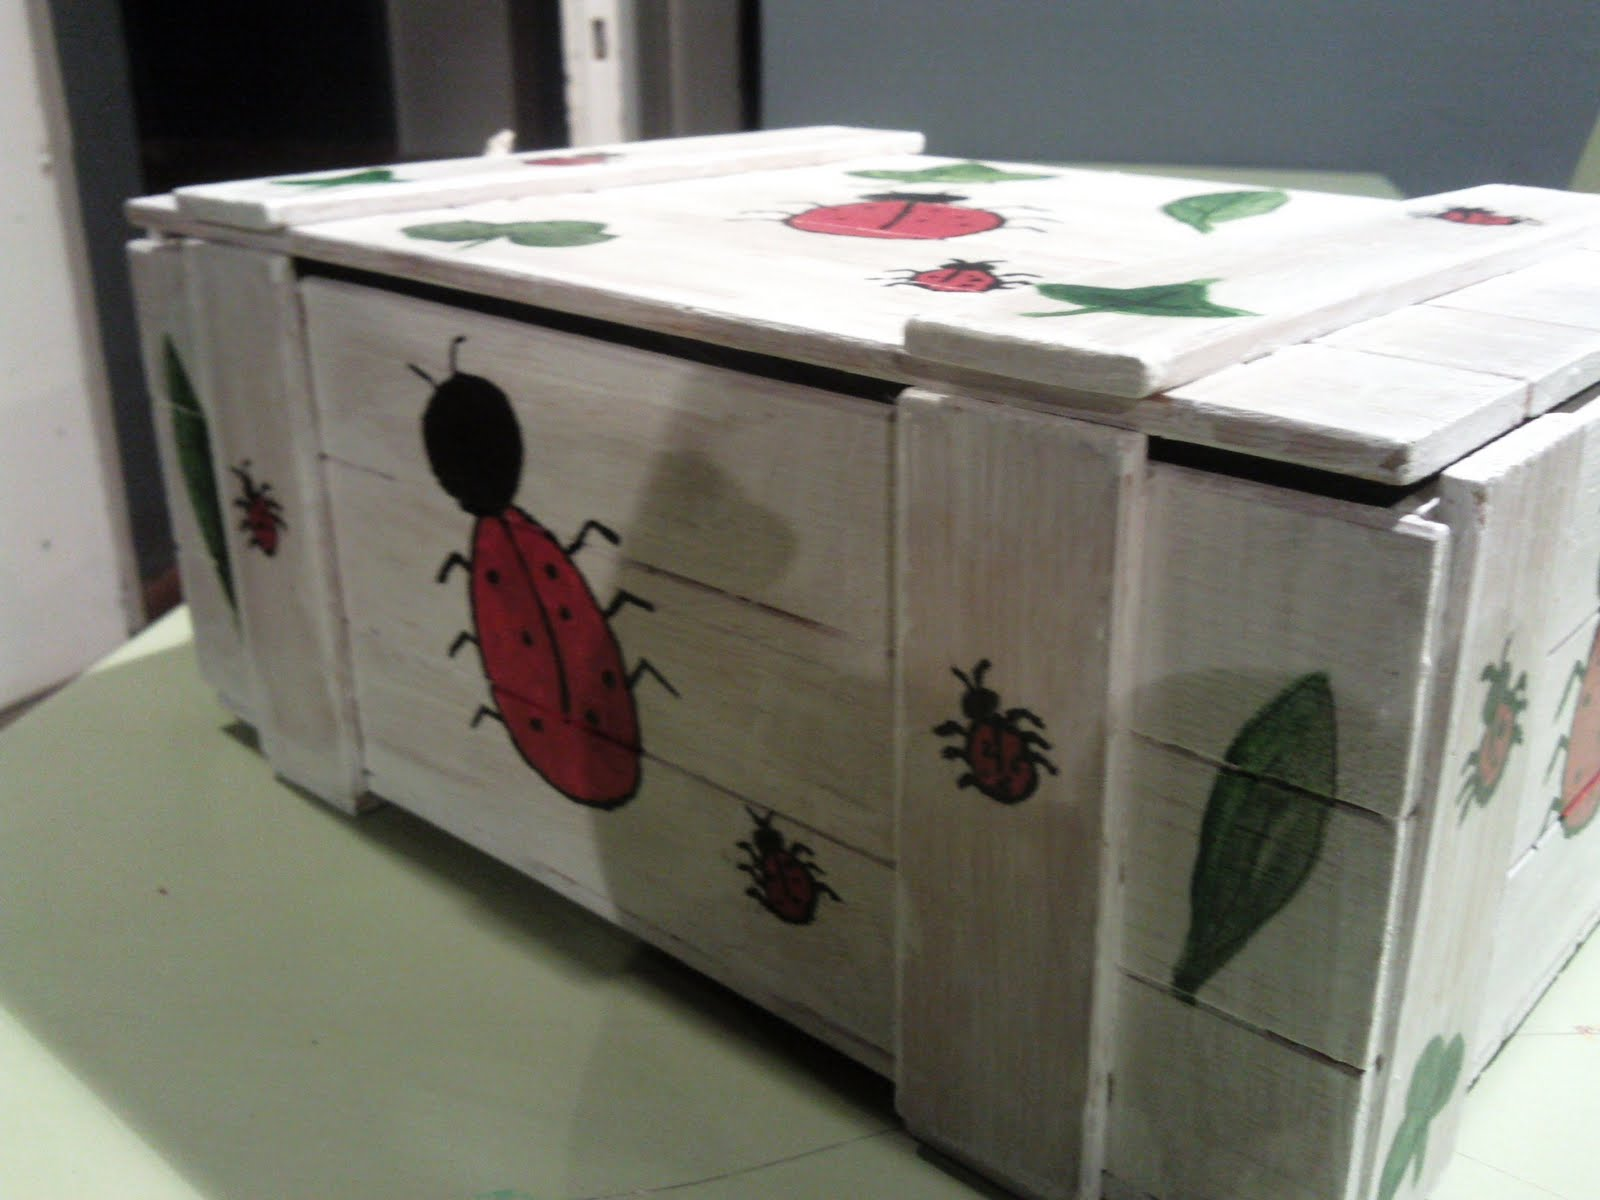 Artes decorativas geli molina caja de madera - Cajas de madera decorativas ...